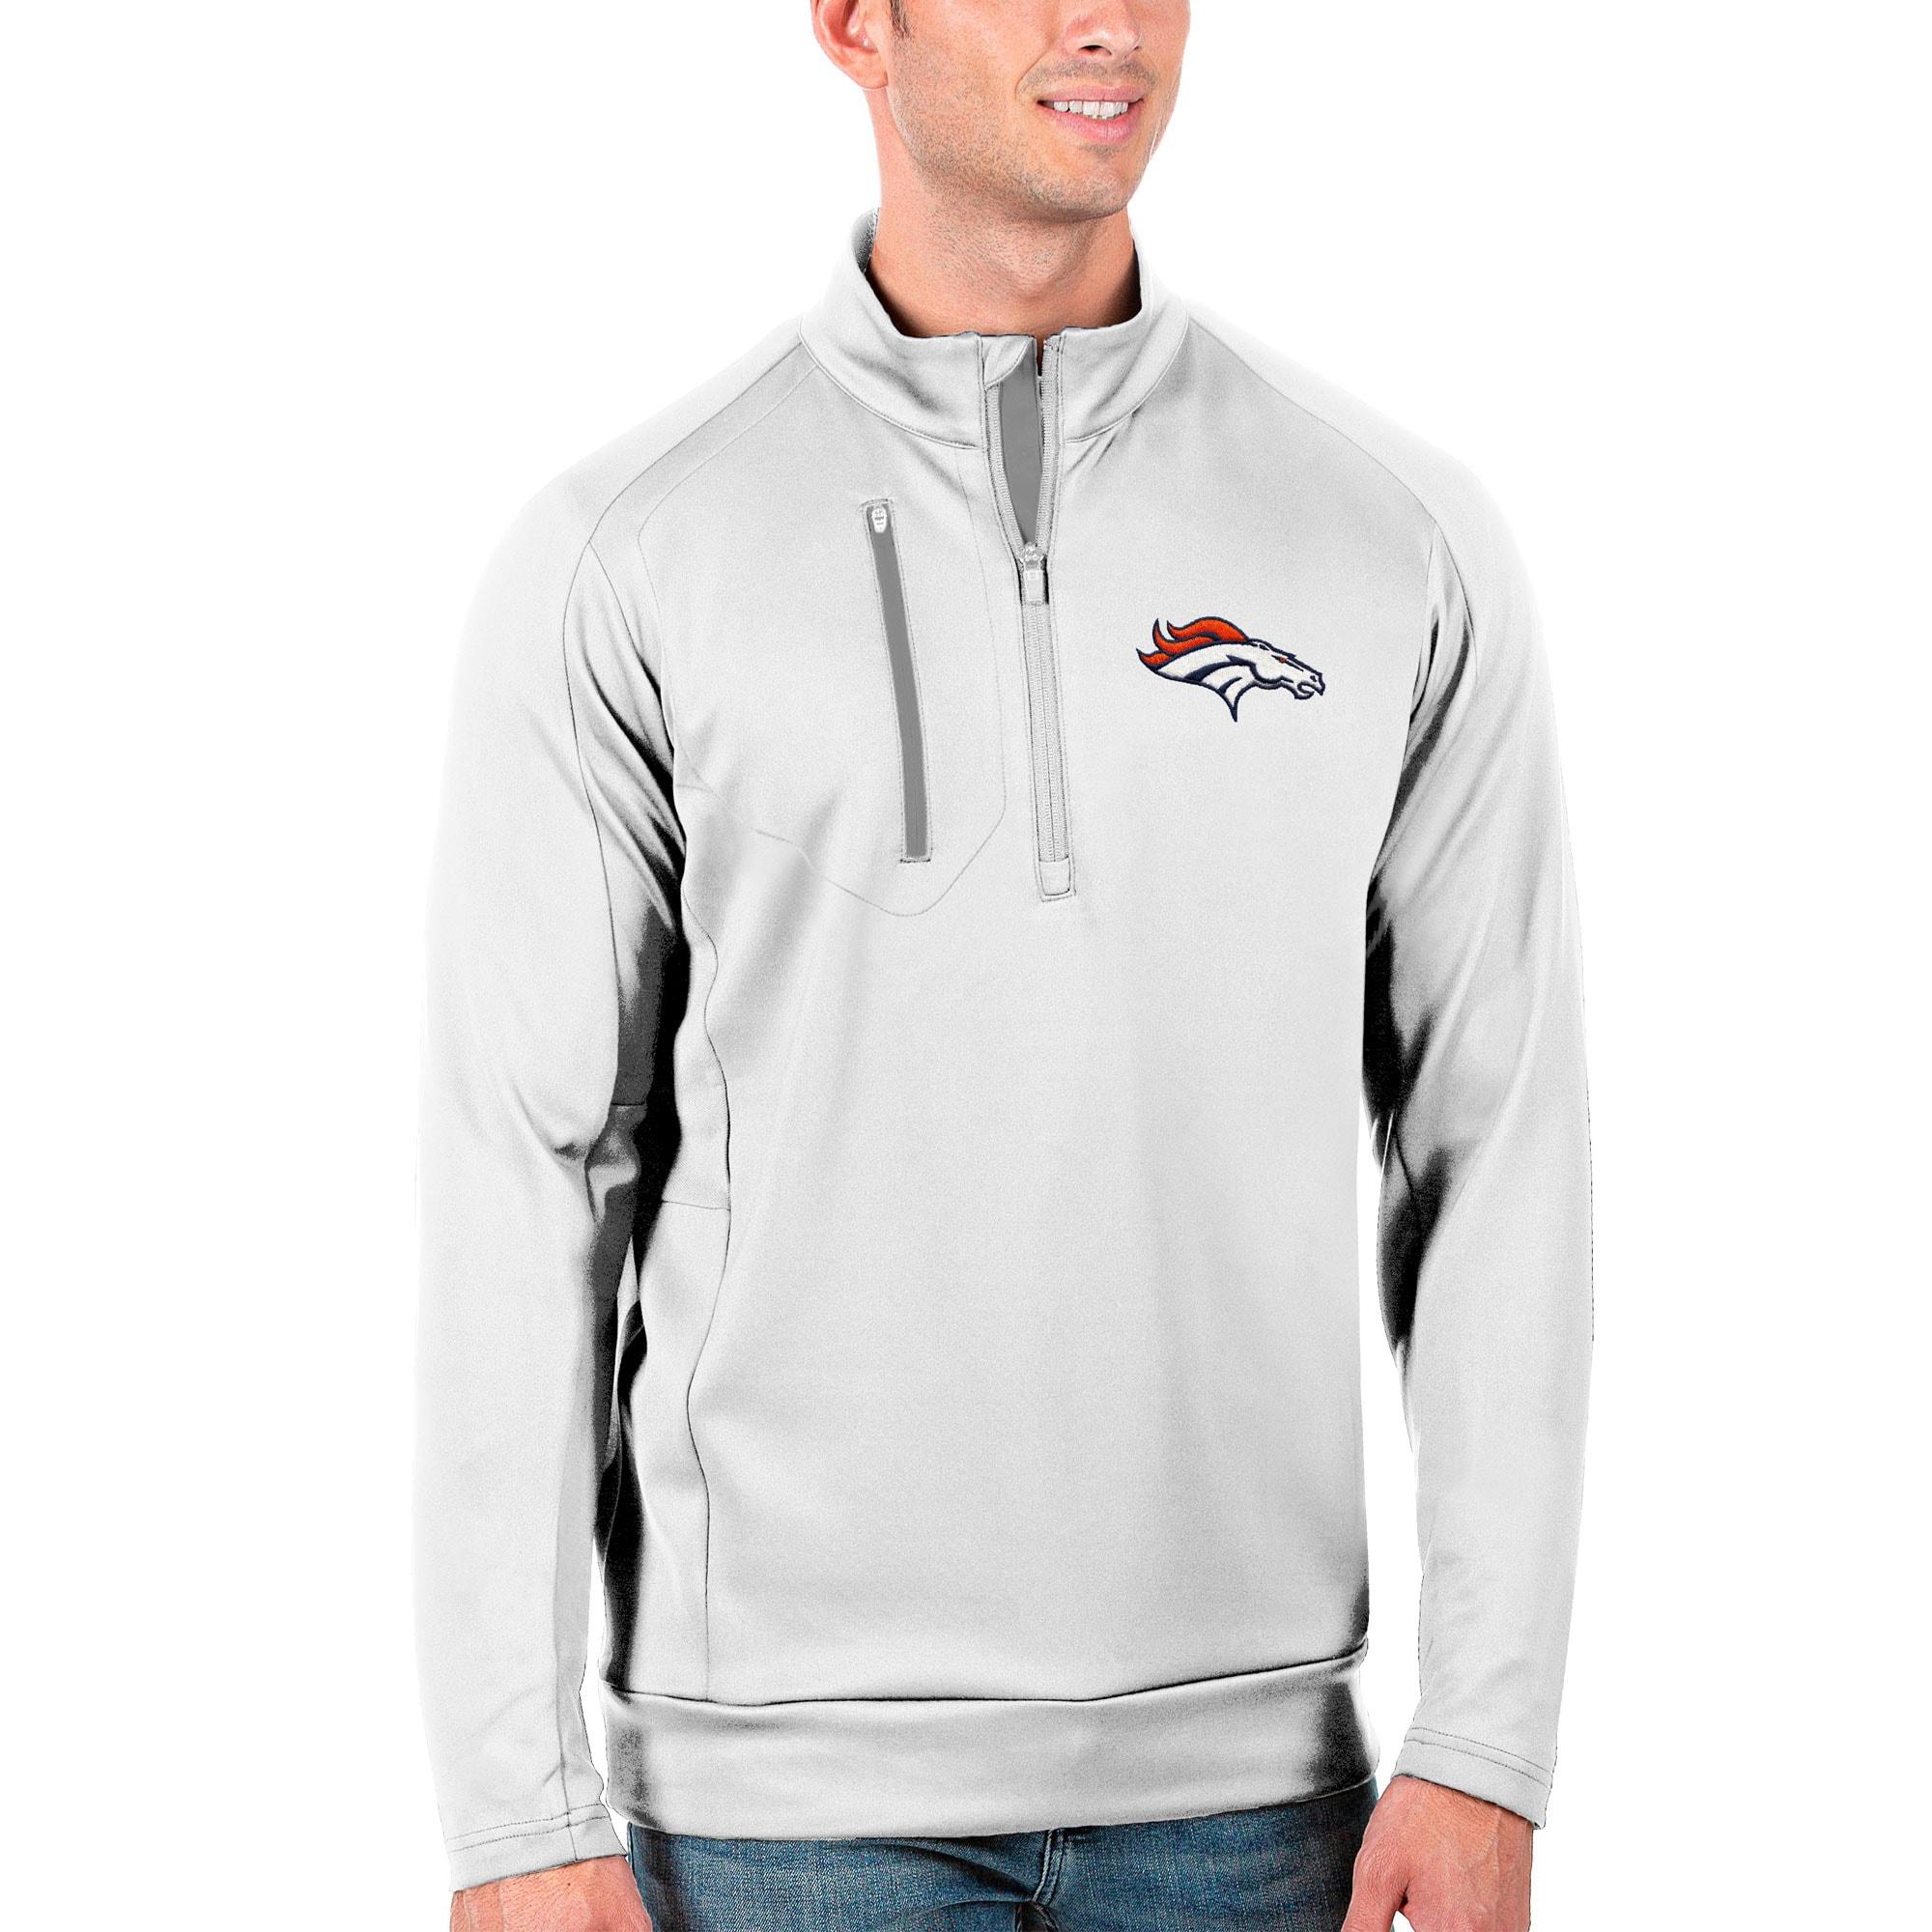 Denver Broncos Antigua Generation Quarter-Zip Pullover Jacket - White/Silver